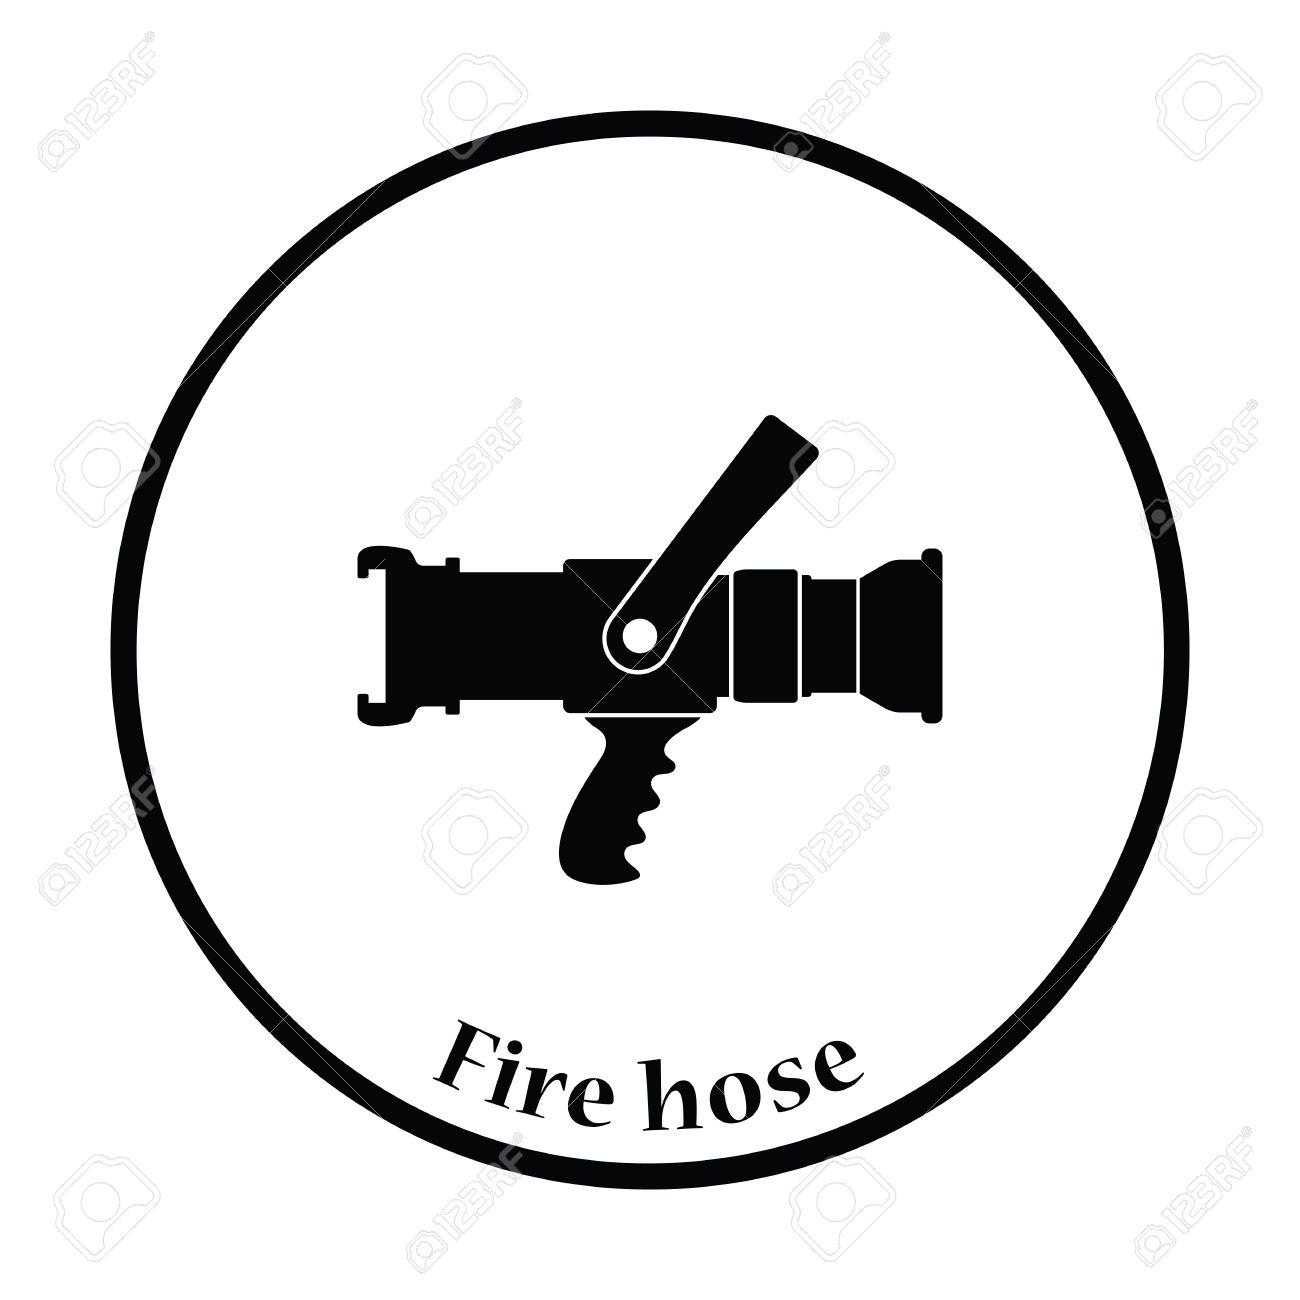 Fire hose icon. Thin circle design. Vector illustration..